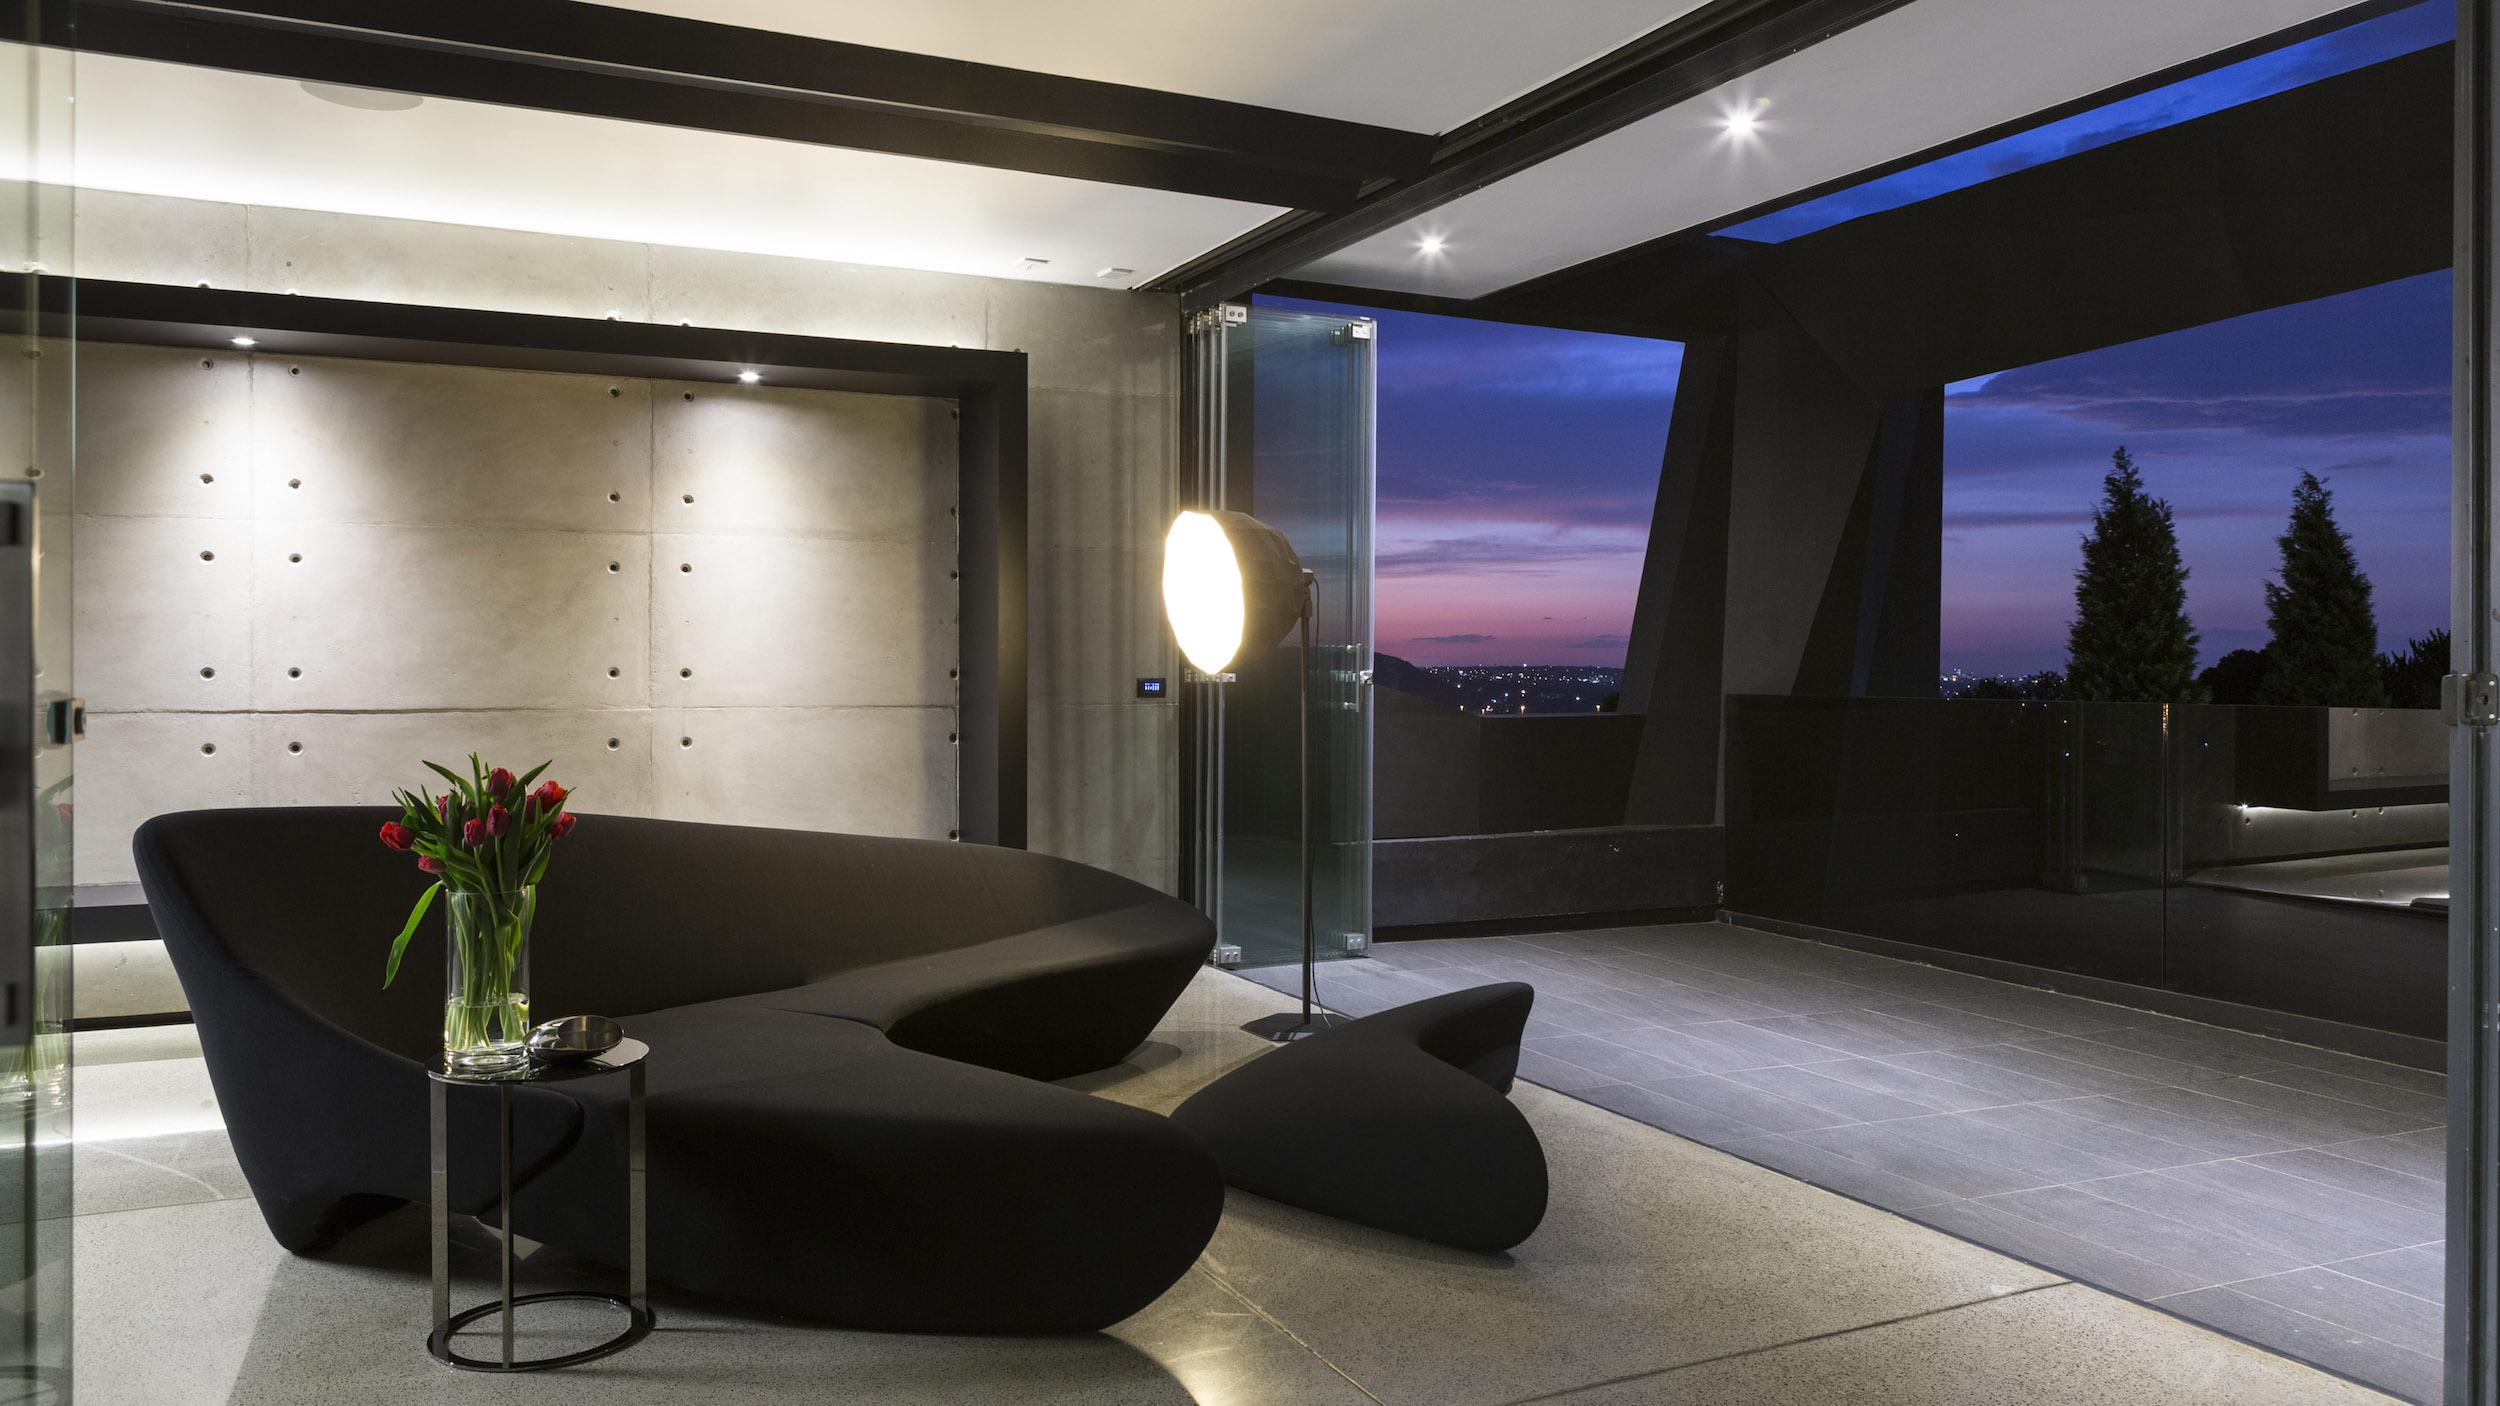 Kloof Road Masterpiece House in Johannesburg by Nico van der Meulen Architects-34